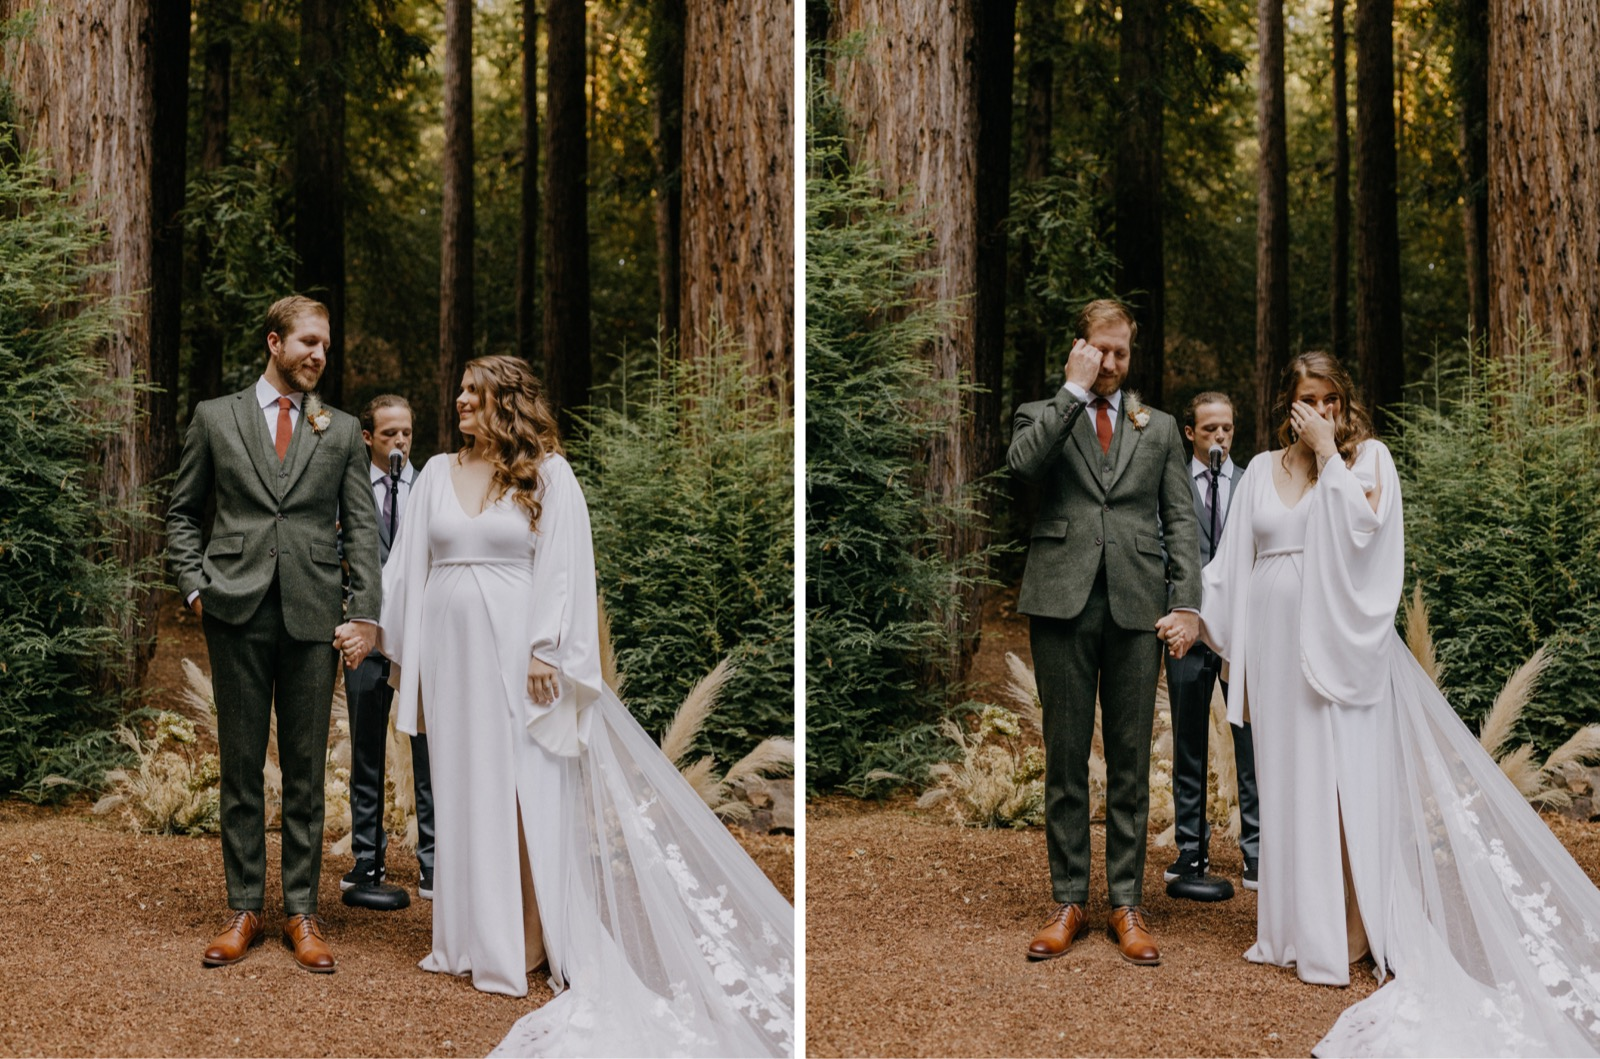 064_Emily & Jeff Wedding 0623_Emily & Jeff Wedding 0622_the-waterfall-lodge_forest_wedding_ben-lomond_intimate